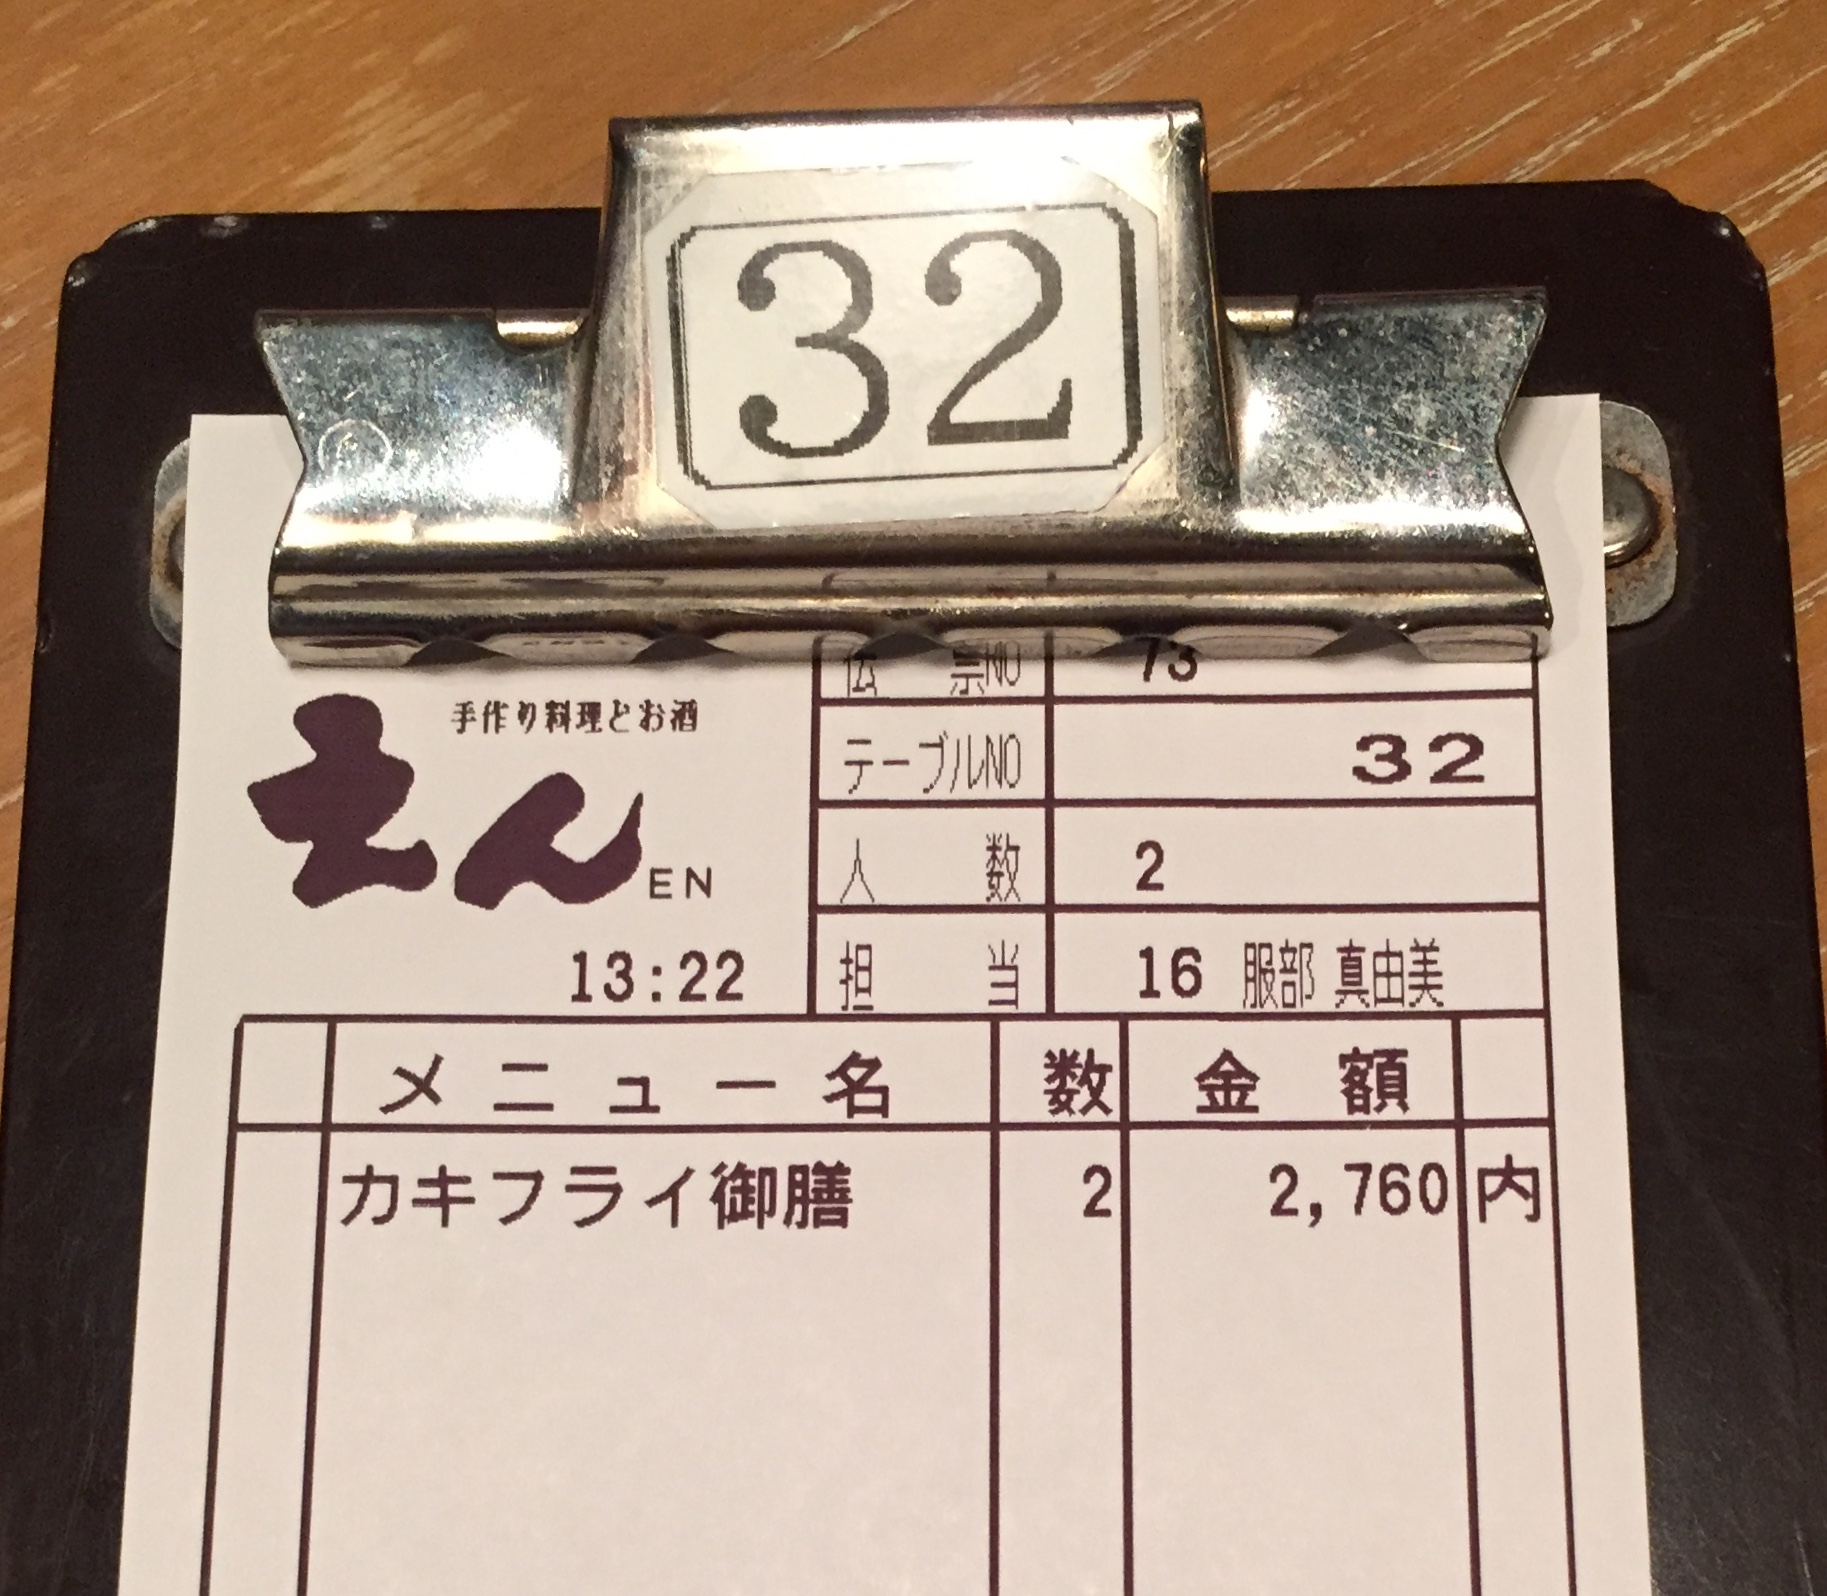 7136B25F-8BA2-4043-97B5-214335B47FDF